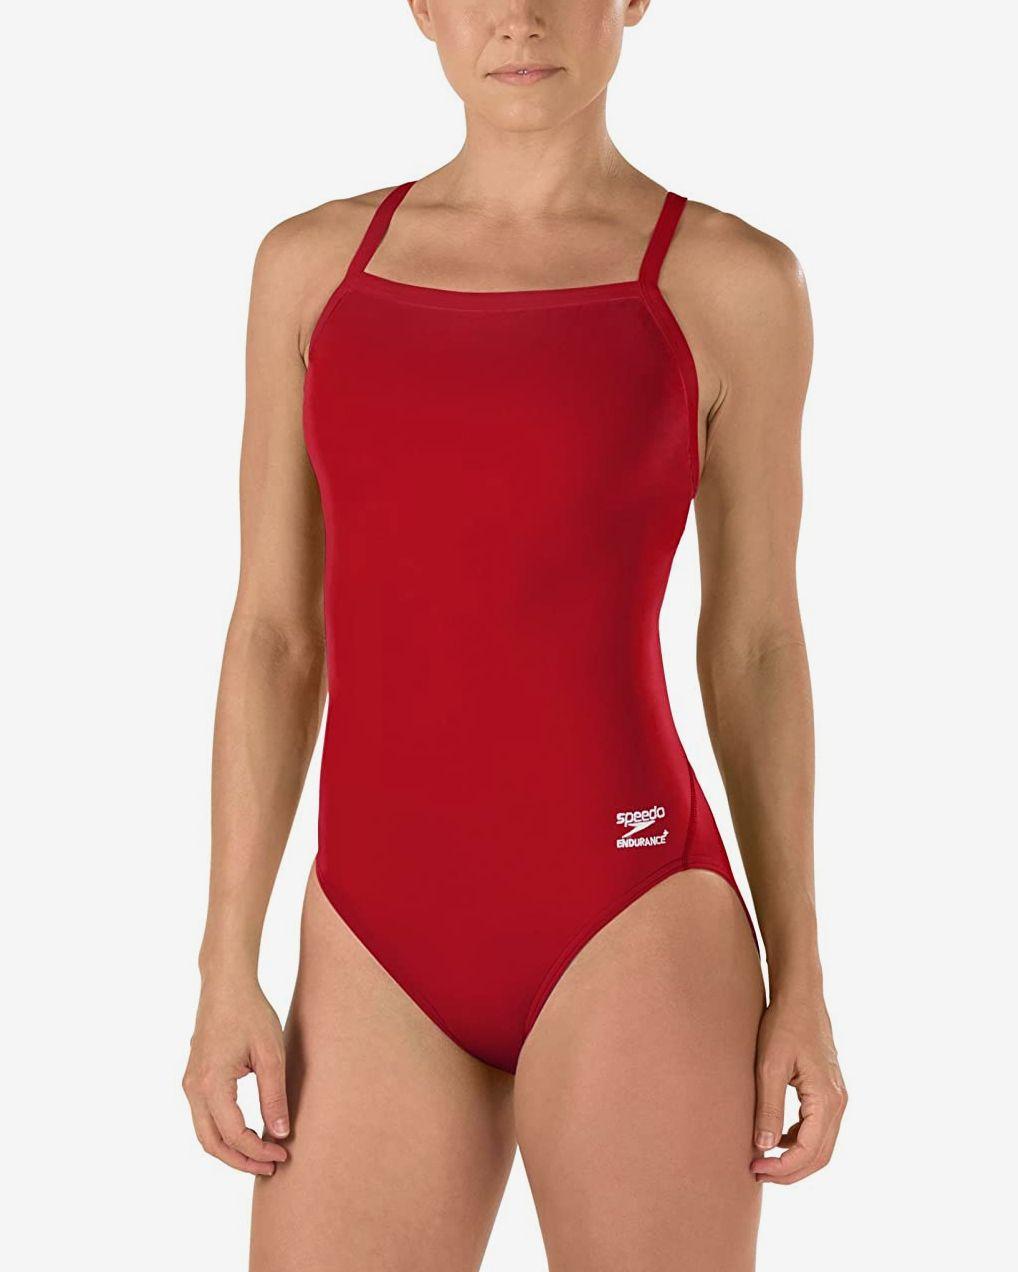 Ruffle 1 Piece Speedo Womens/' Swimsuit Black